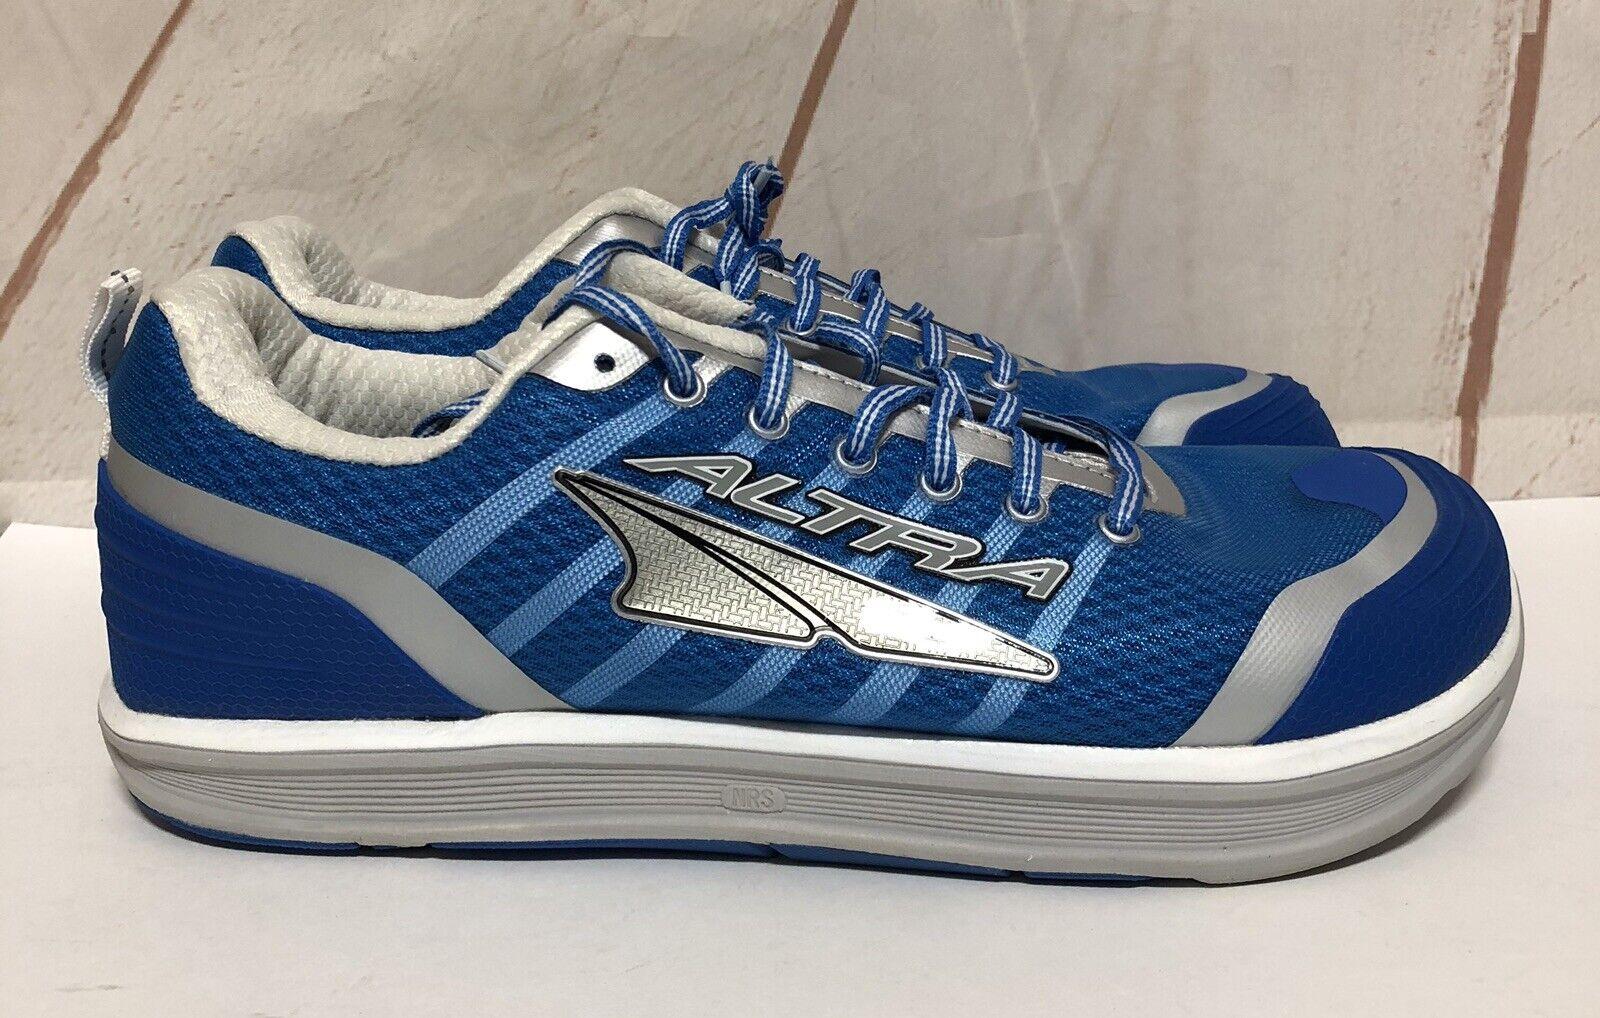 Altra Instinct 2.0 Men bluee Sneaker Running shoes Size 12 New